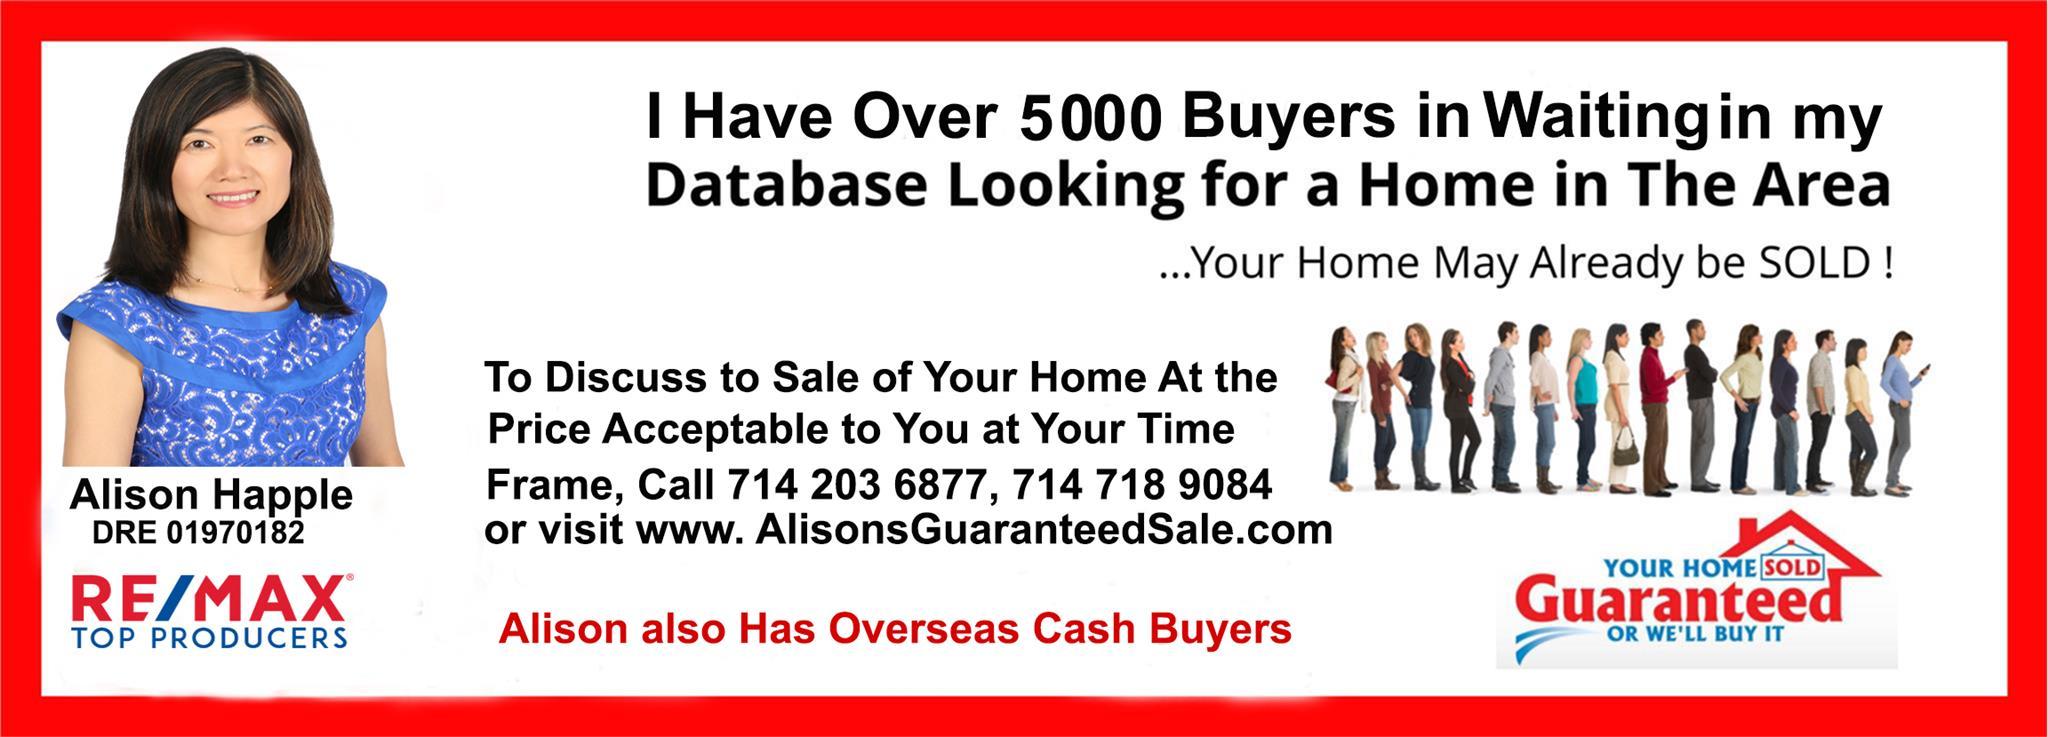 banner-we have buyers.jpg